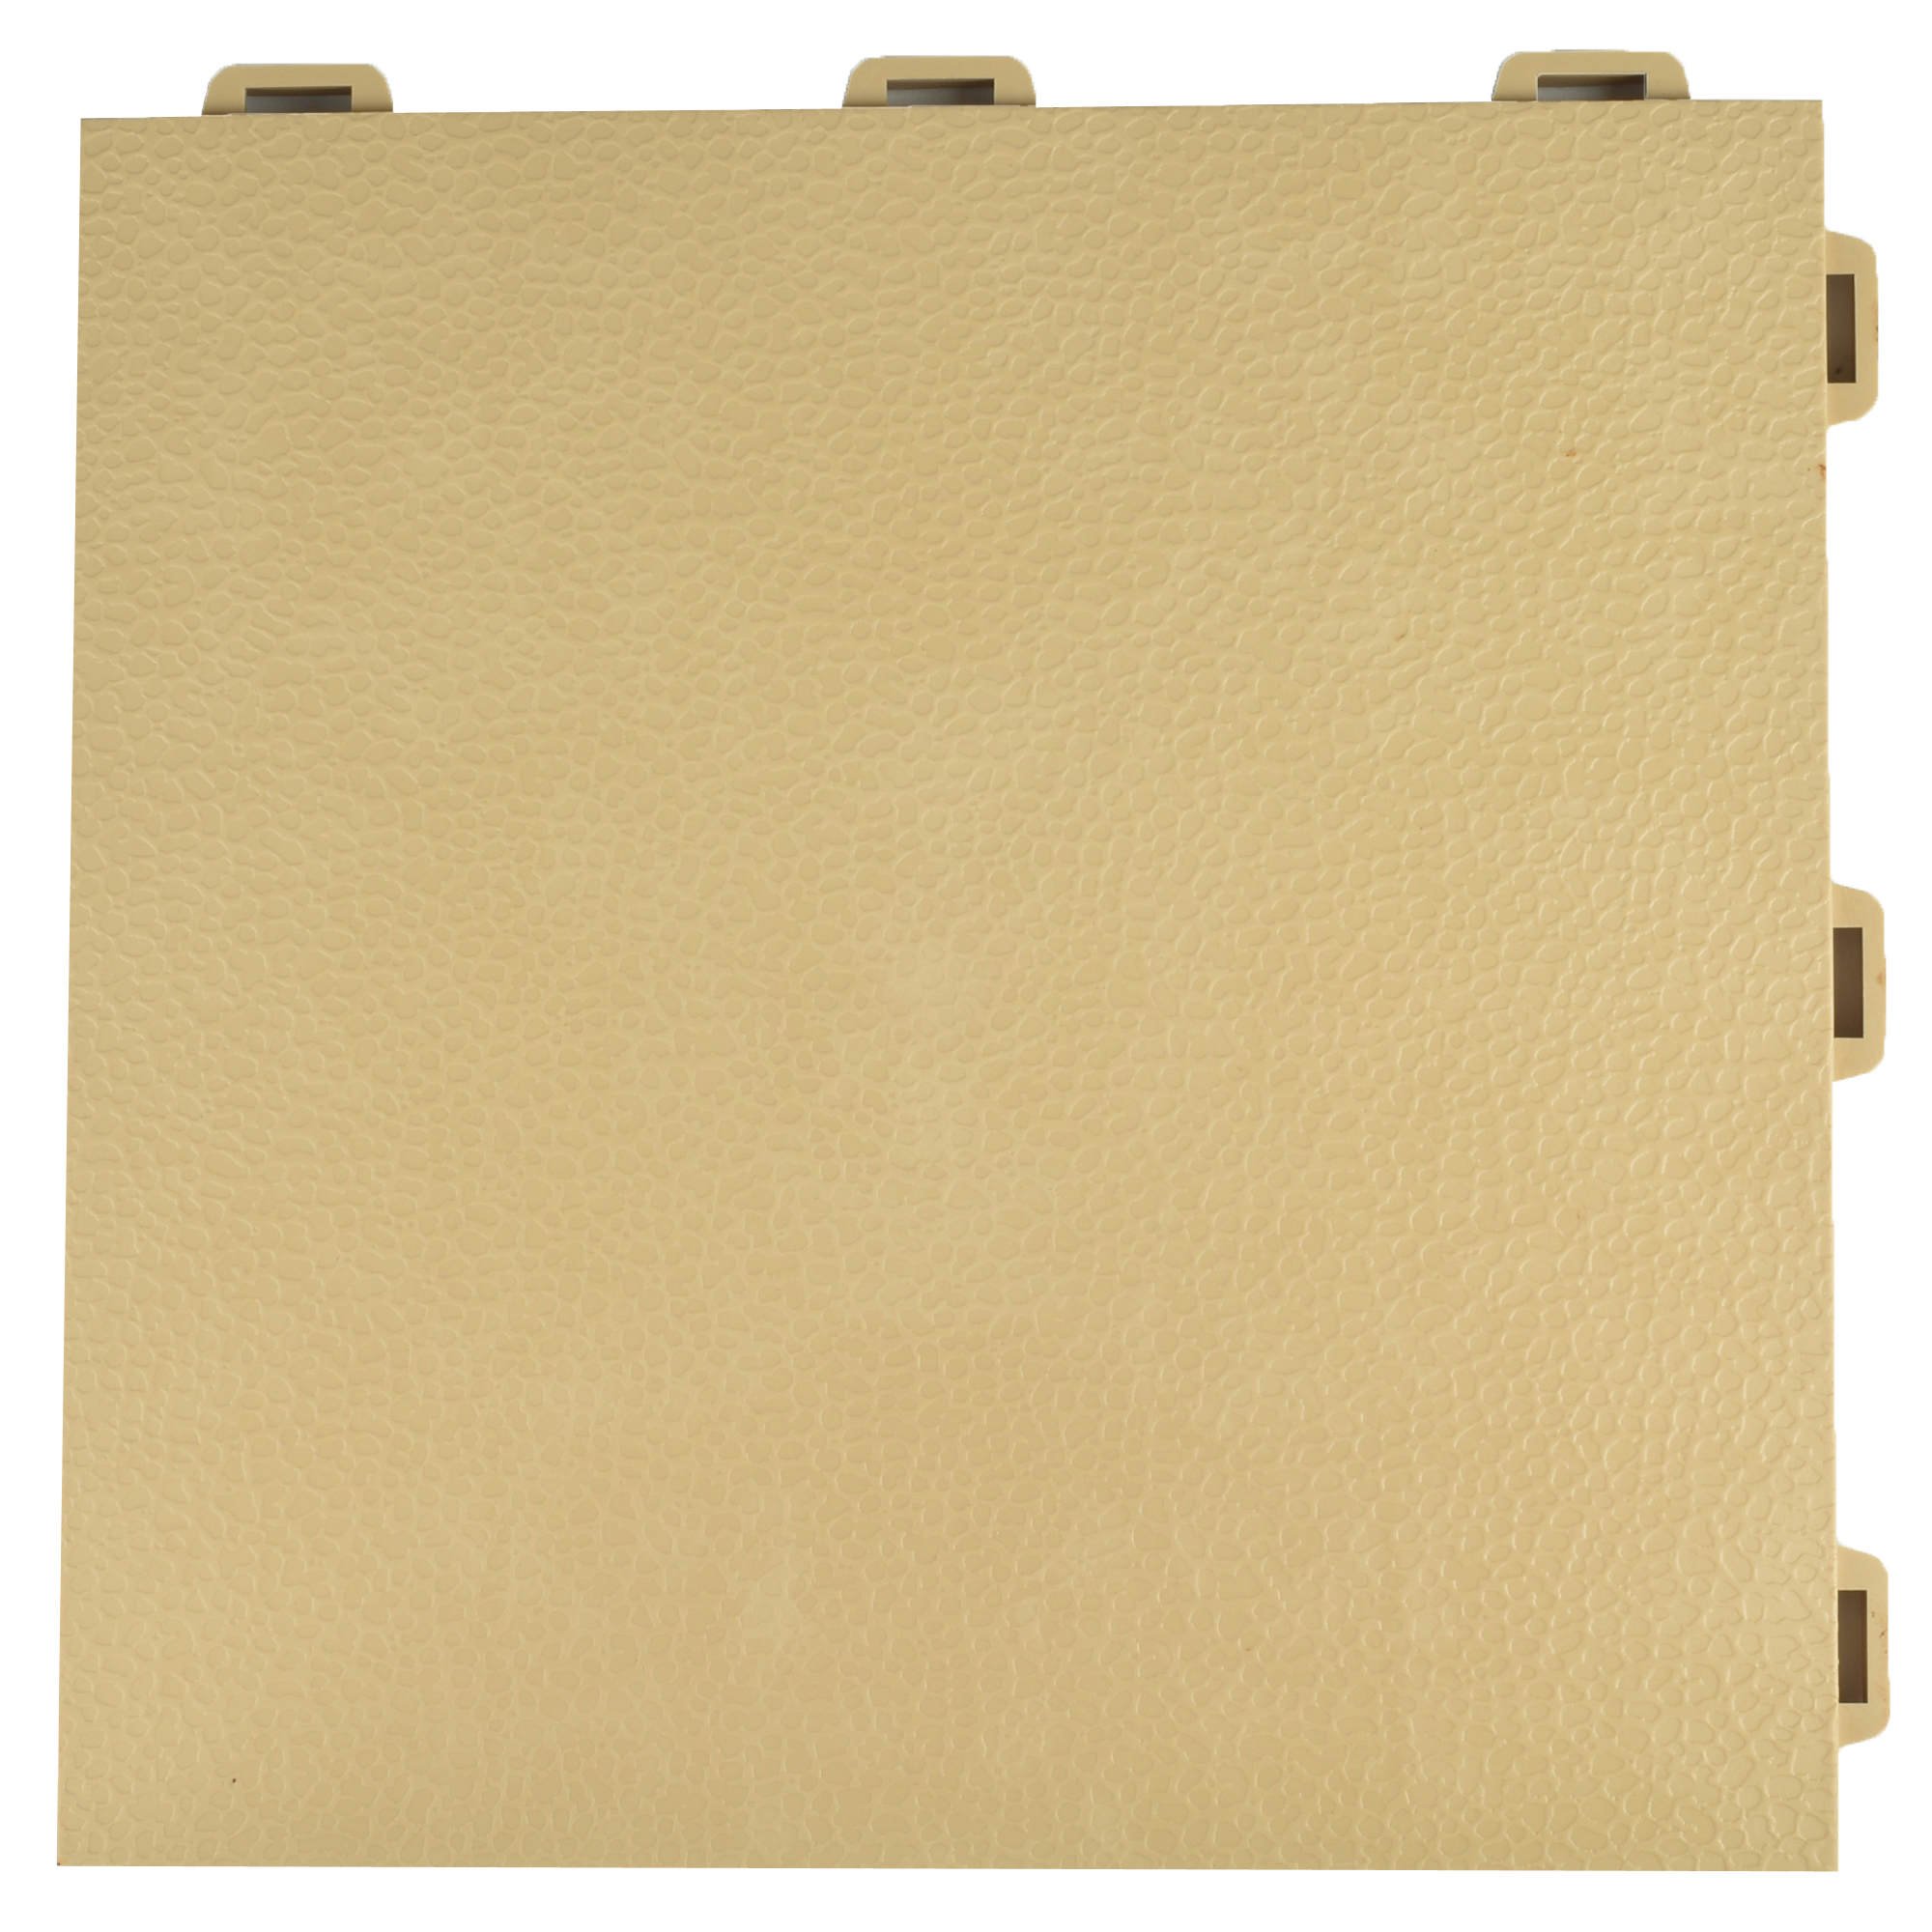 Greatmats PVC Plastic Interlocking Basement Floor Tile 12 in. x 12 in. x 0.56 in. StayLock Orange Peel Top Green 26 Pack